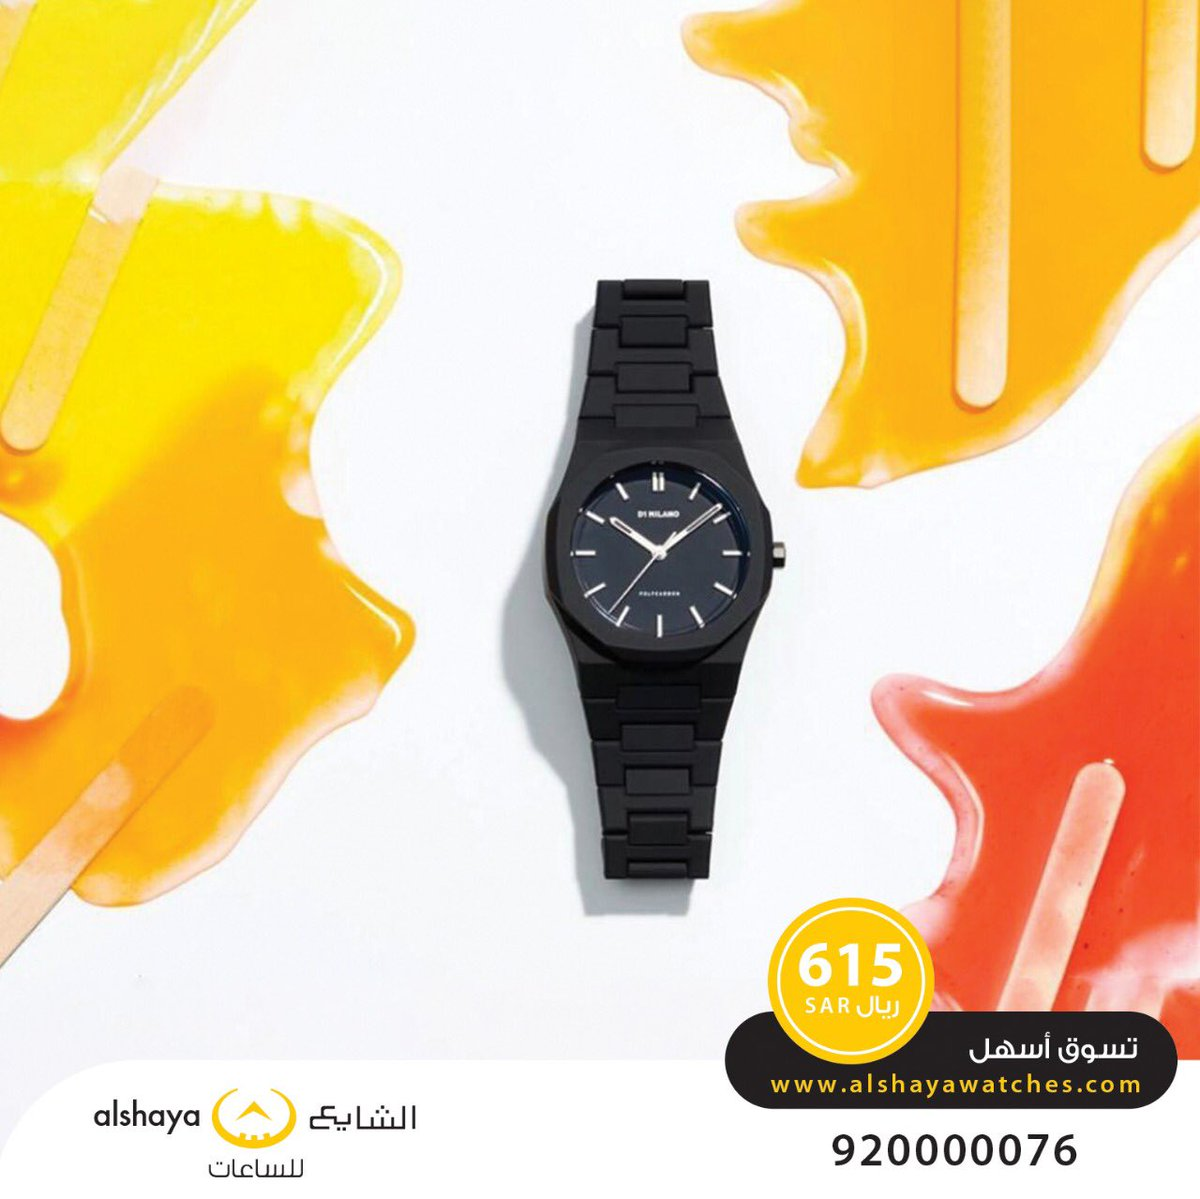 87f485896 تسوق الآن ..  https://alshayawatches.com/ar/products/d1-milano-cloudburst-men-s-watch-ml-0104  …pic.twitter.com/URg0LVBCSp